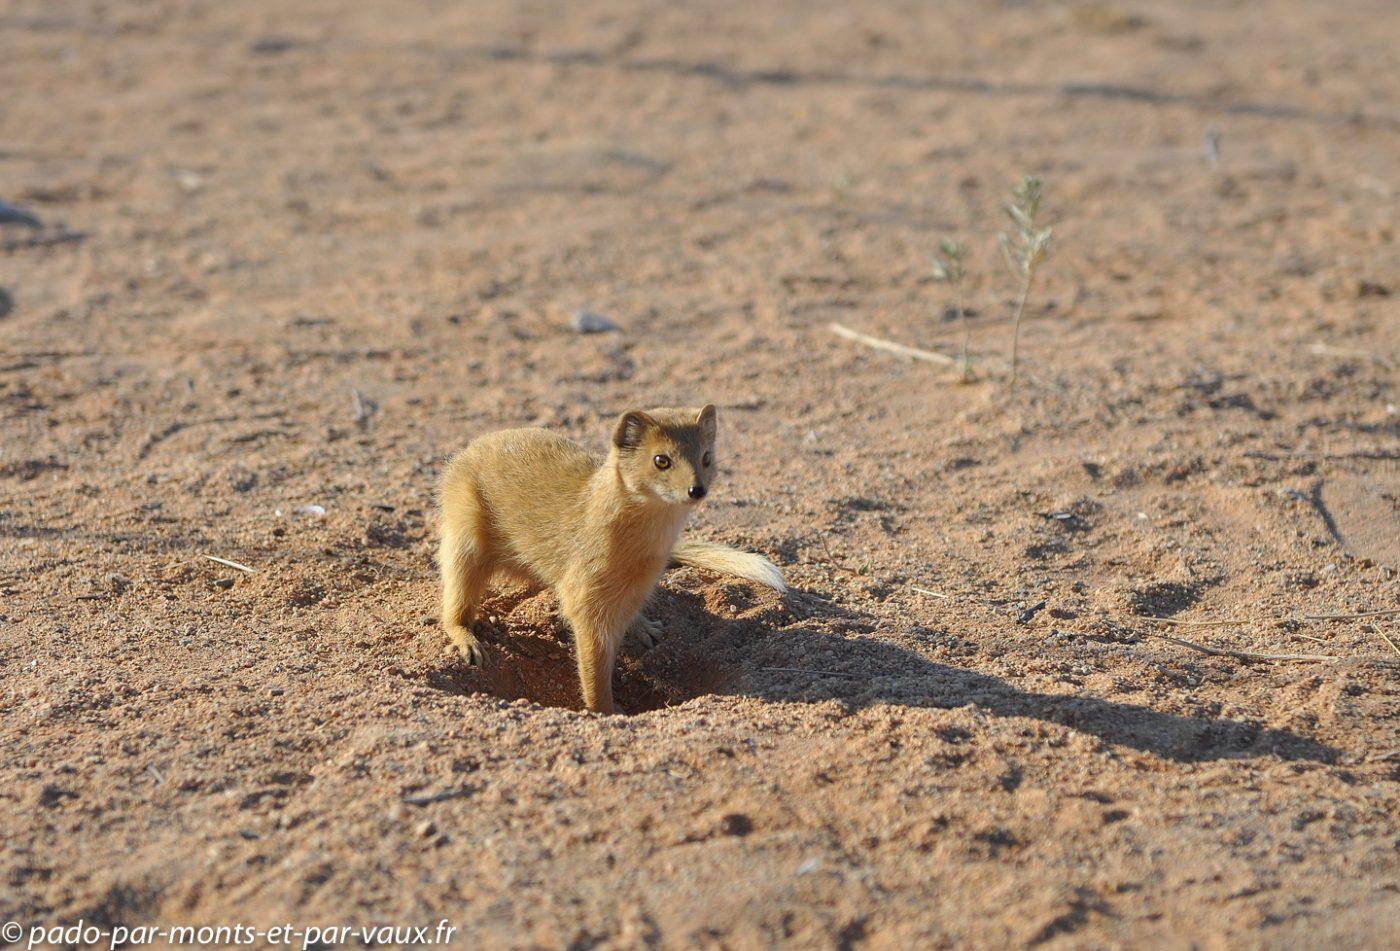 Namibie 2013 - Solitaire - Mangouste jaune